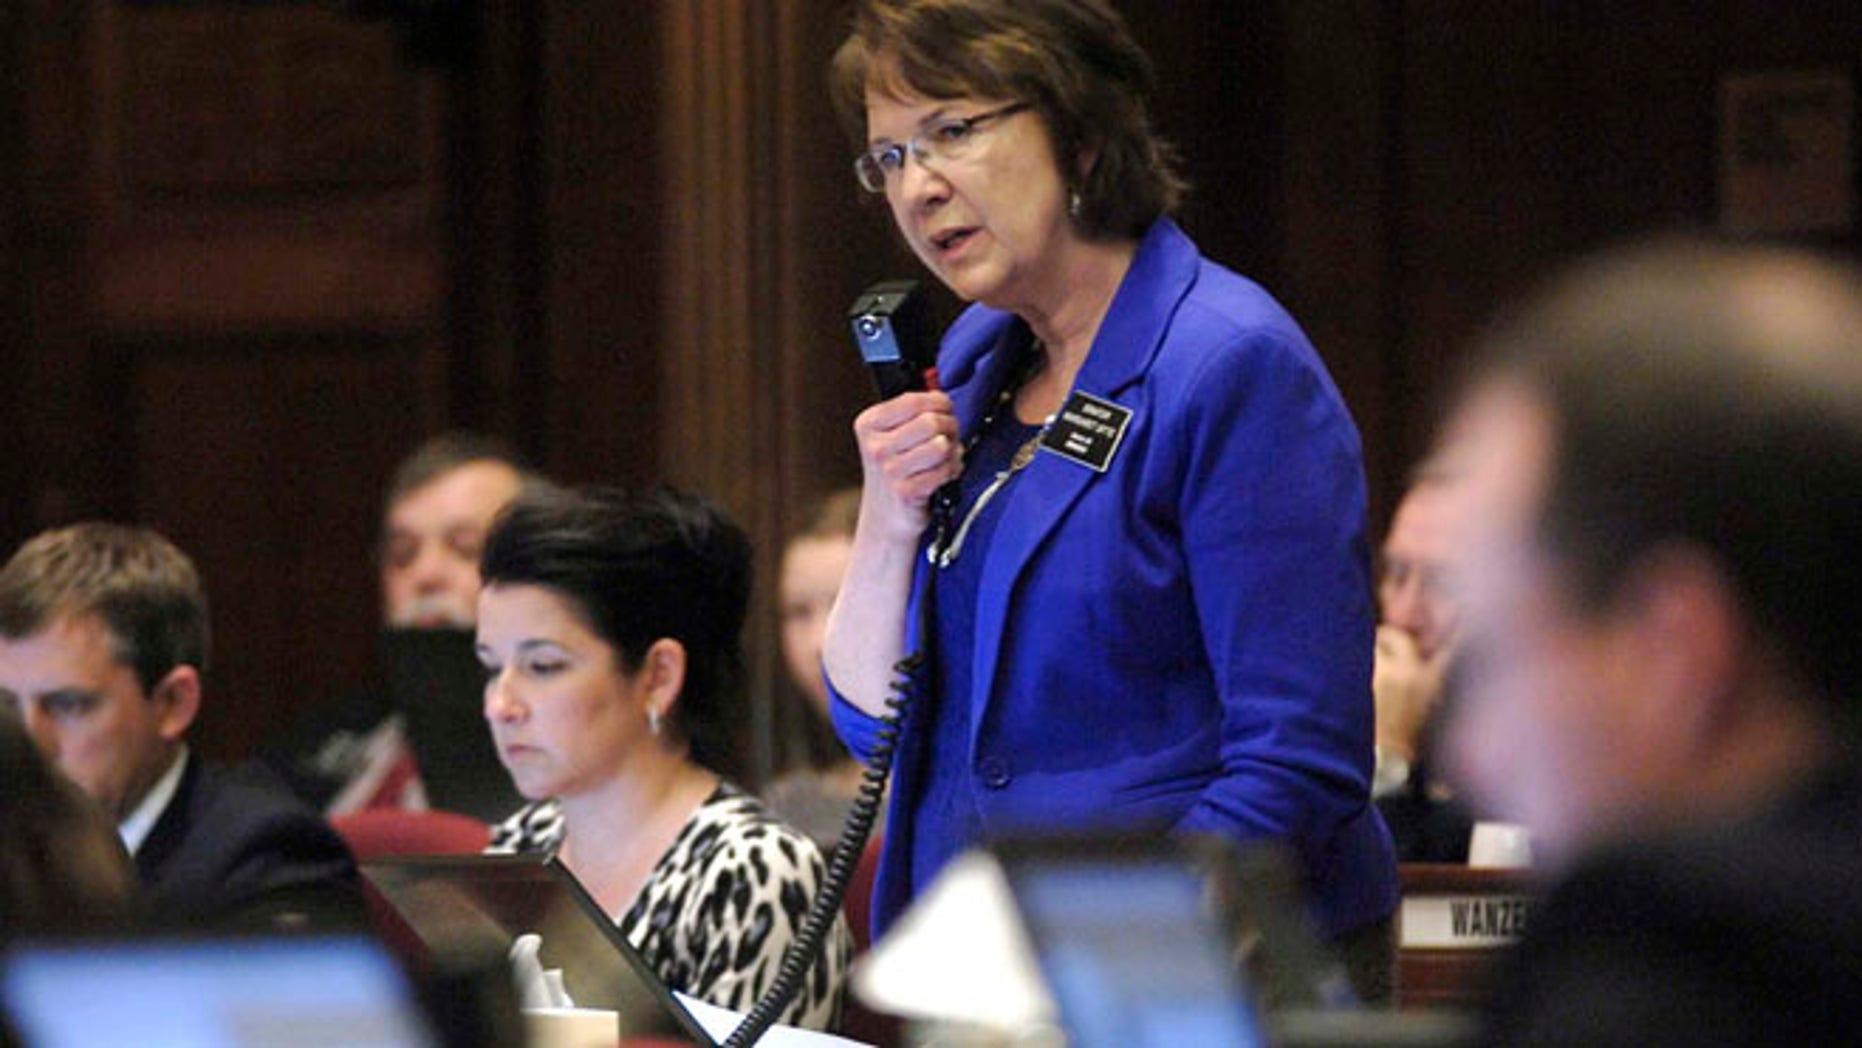 March 15, 2013: North Dakota state Sen. Margaret Sitte, R-Bismarck, speaks in favor of HB1305 during the chamber floor debate at the state Capitol in Bismarck, N.D.